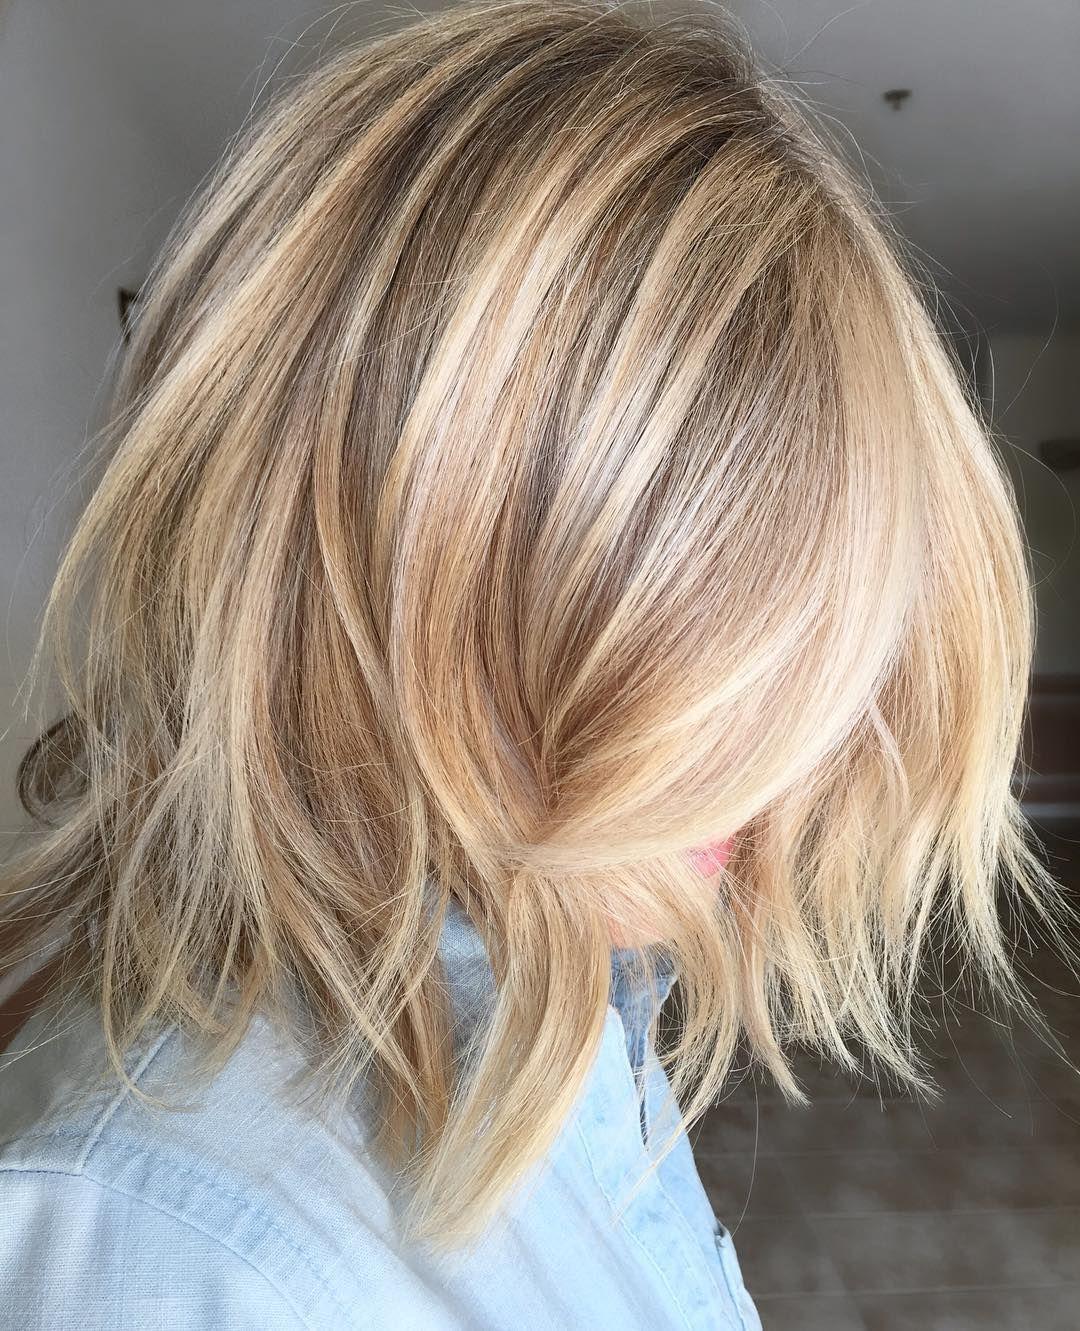 ways to style short hair women haircuts medium shoulder length